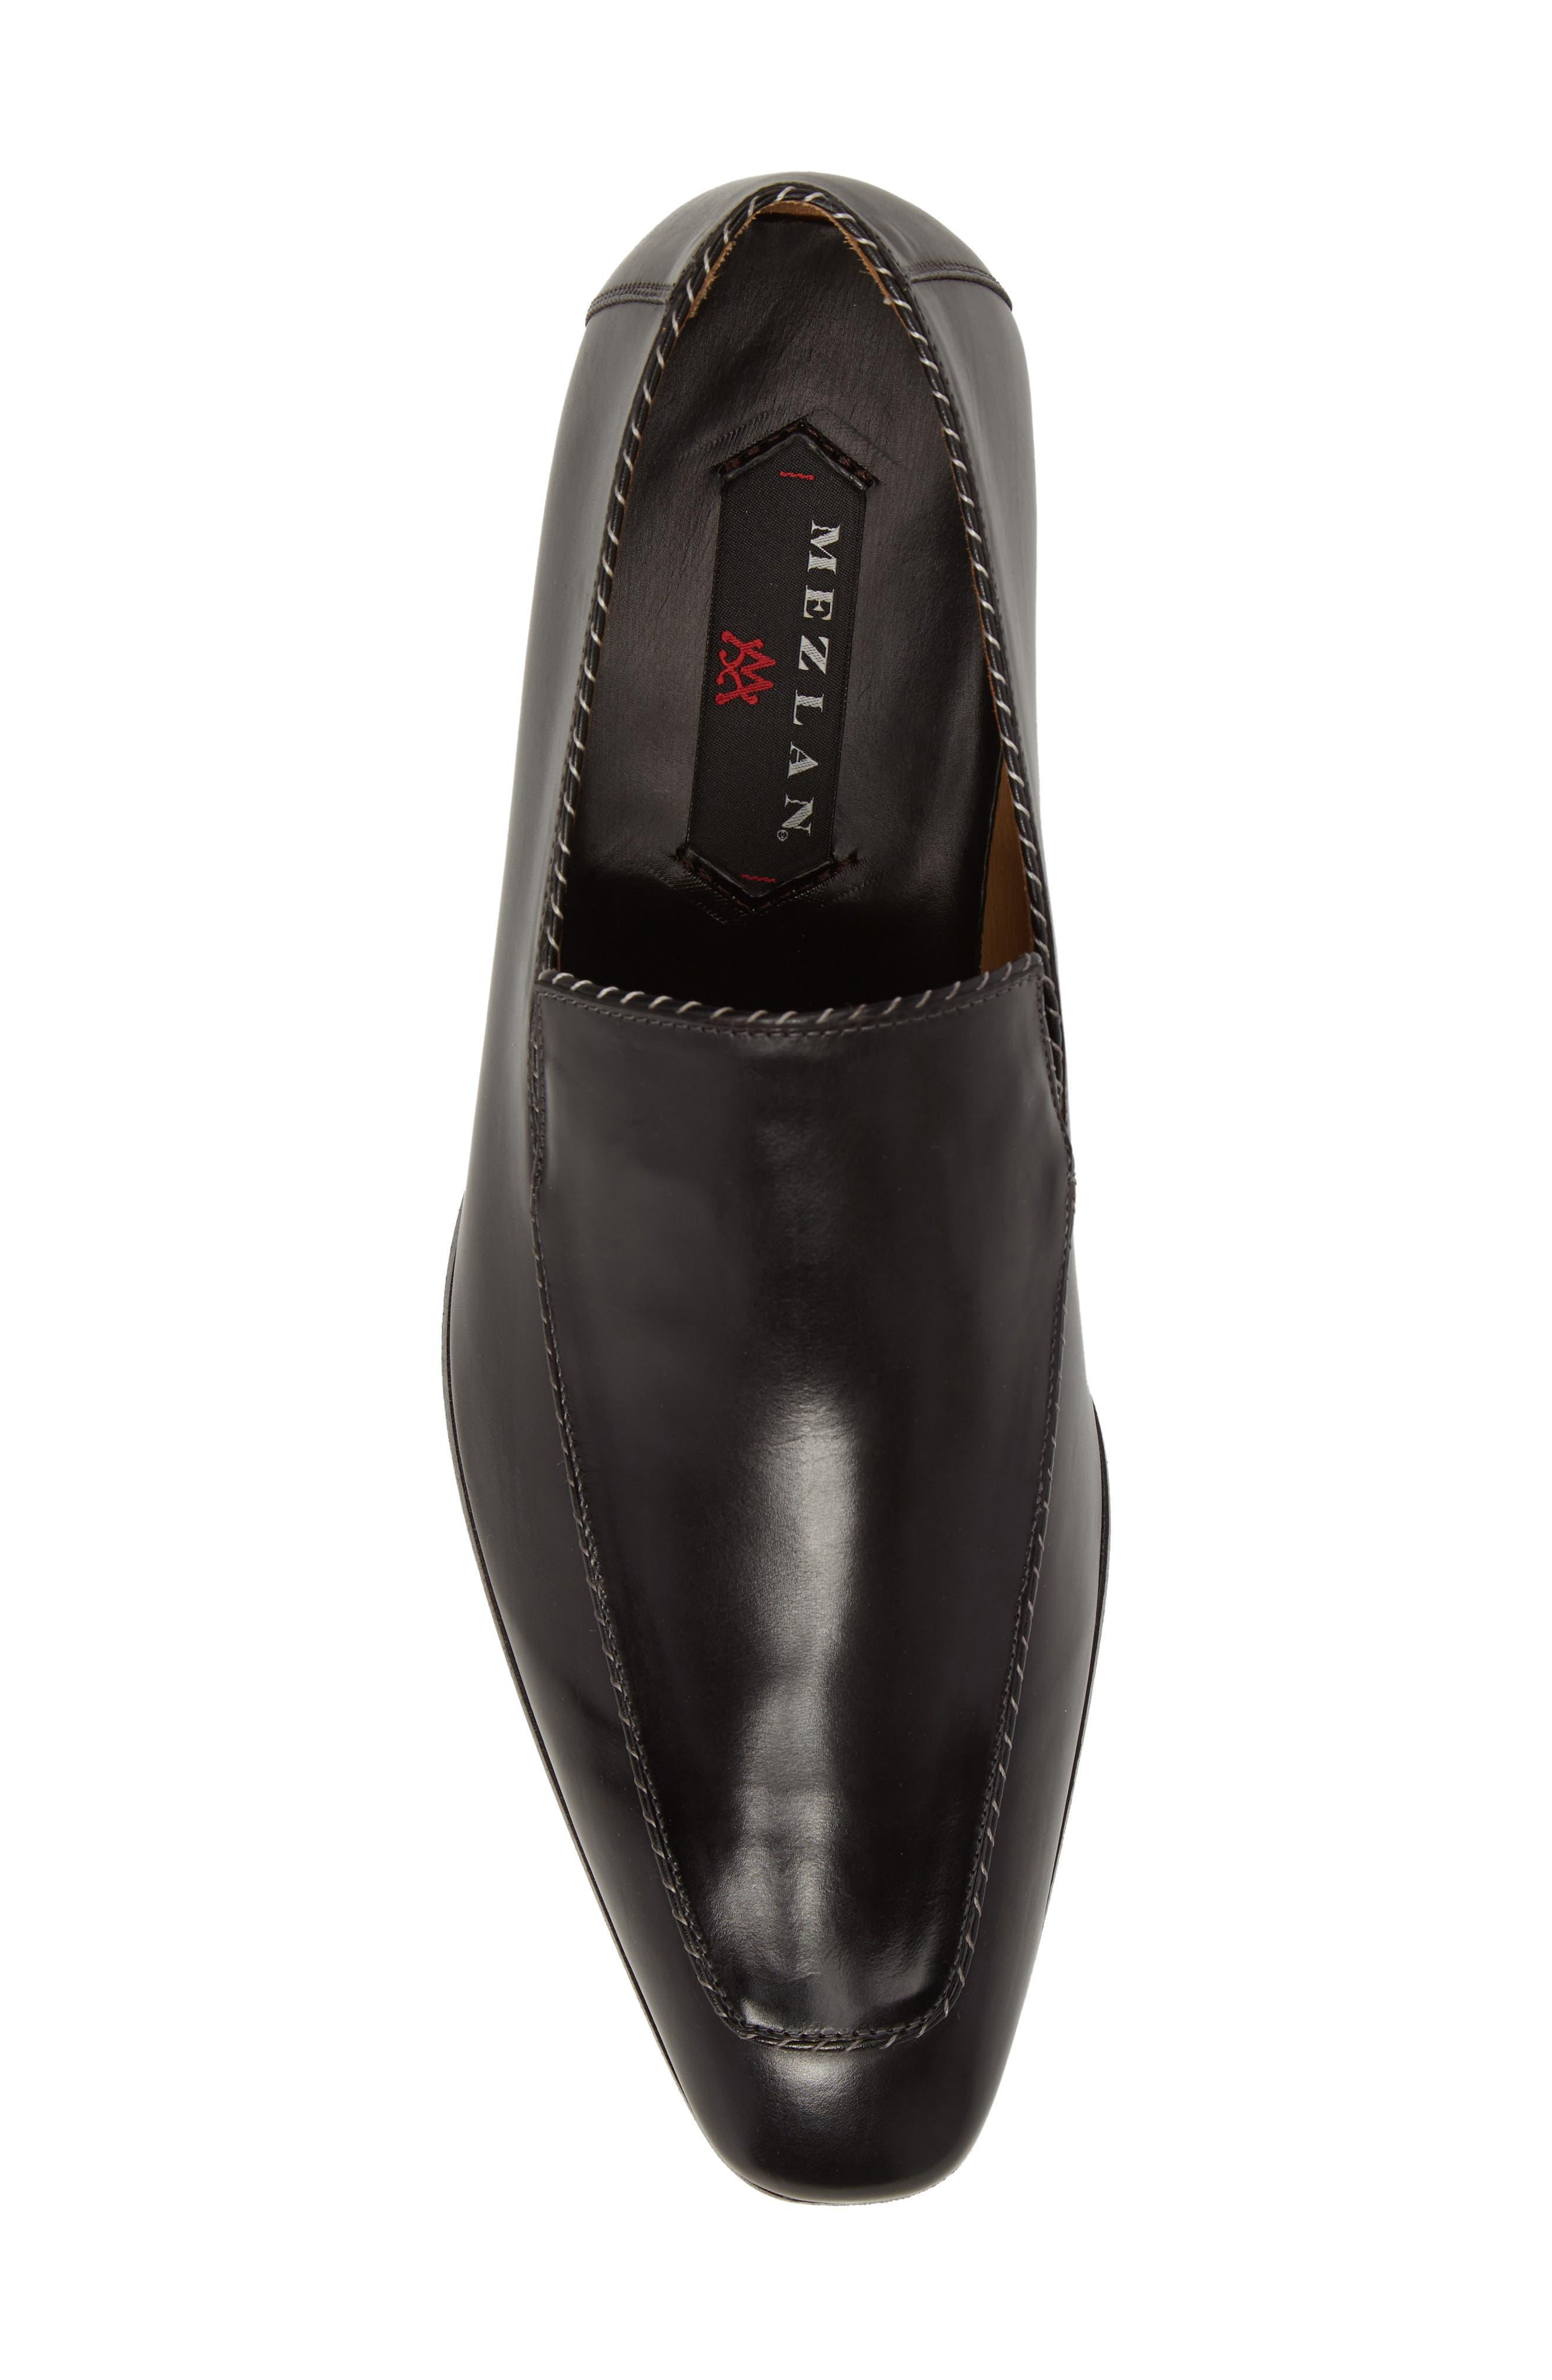 Brandt Venetian Loafer,                             Alternate thumbnail 5, color,                             Black Leather